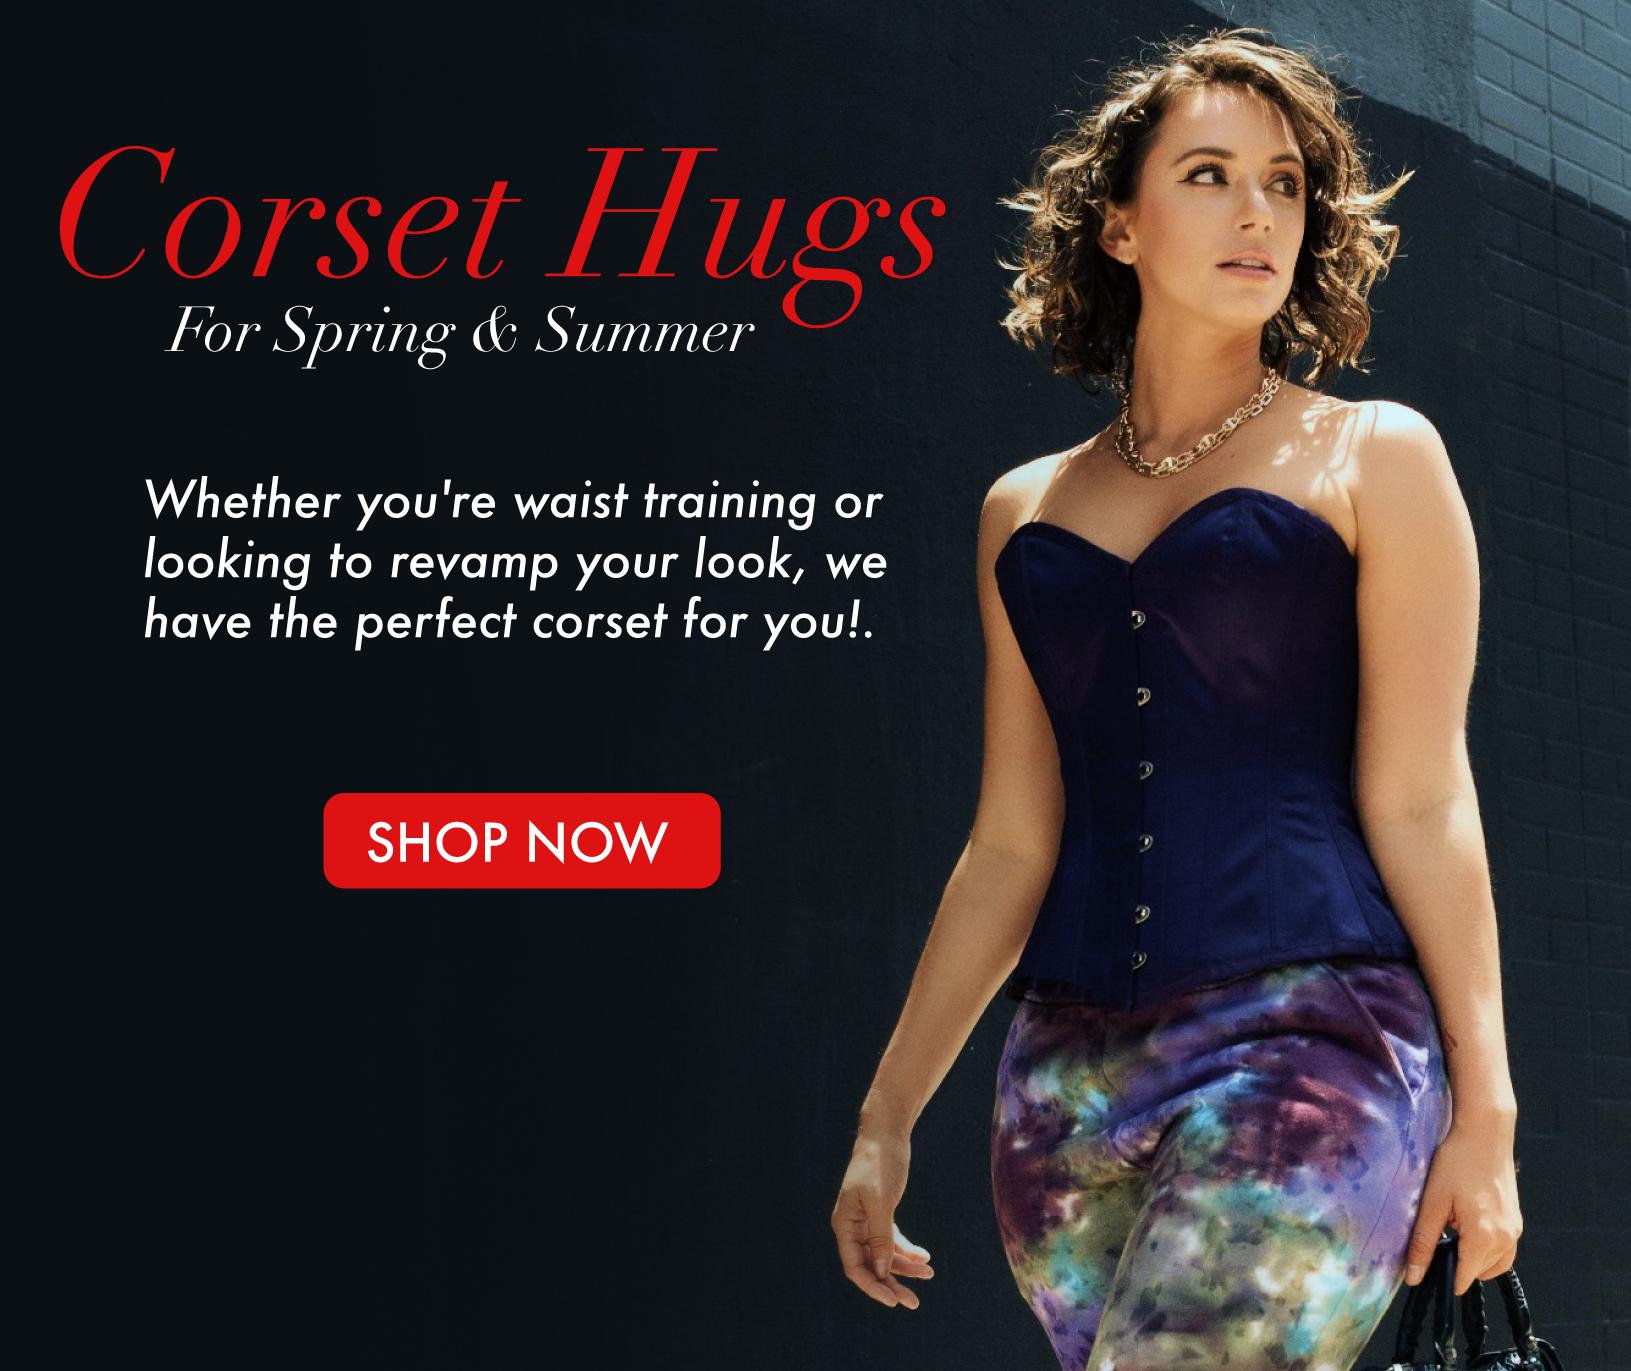 Steel boned corsets